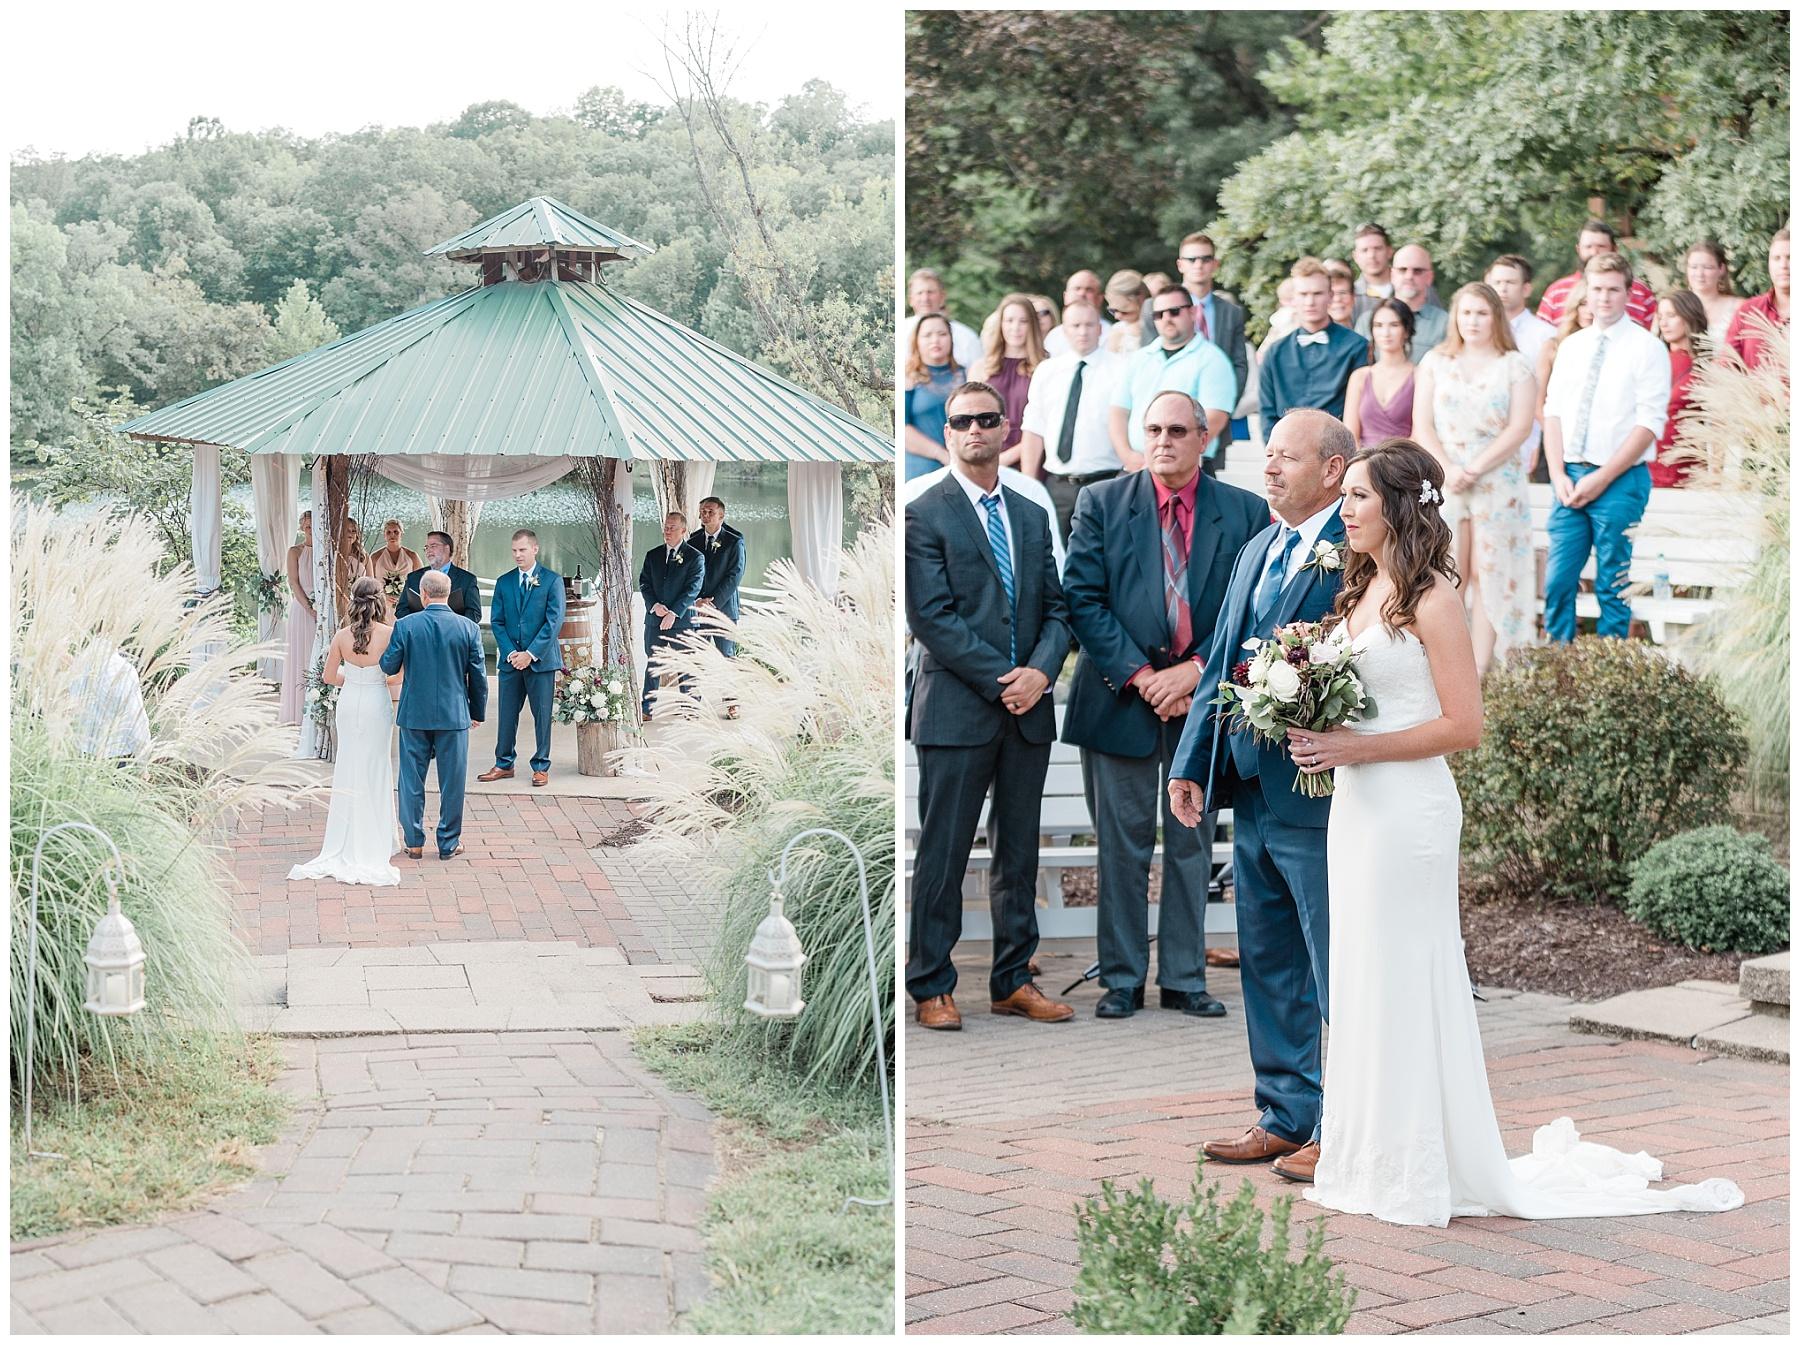 Romantic Summer Sunset Wedding Ceremony at Little Piney Lodge St. Louis Missouri by Kelsi Kliethermes Photography Fine Art Photographer_0053.jpg